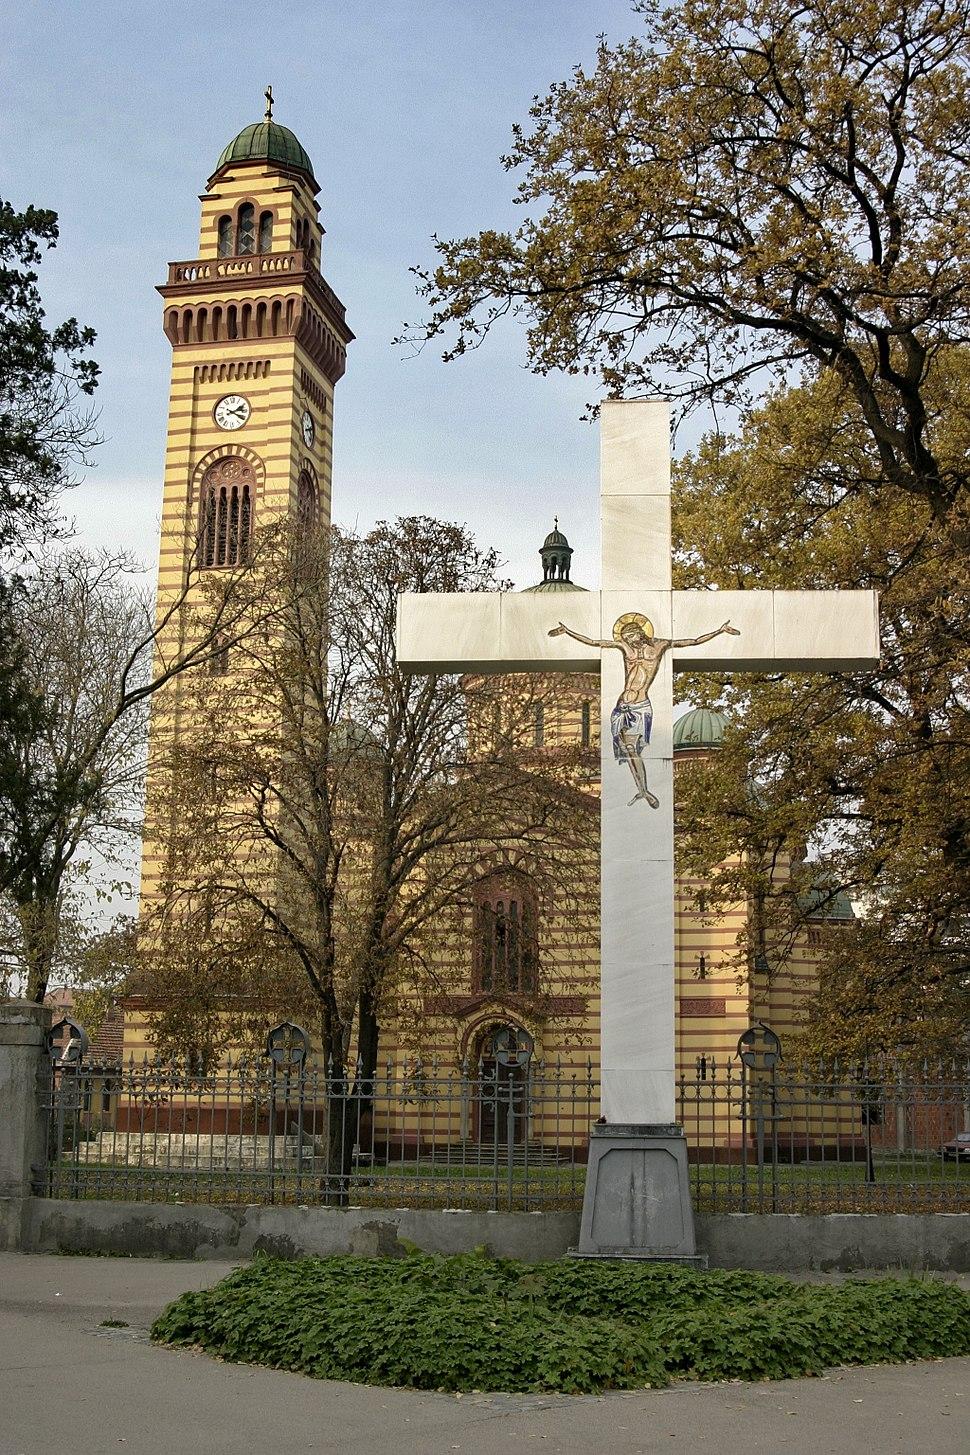 Church of St. Peter and Paul, Jagodina, Serbia